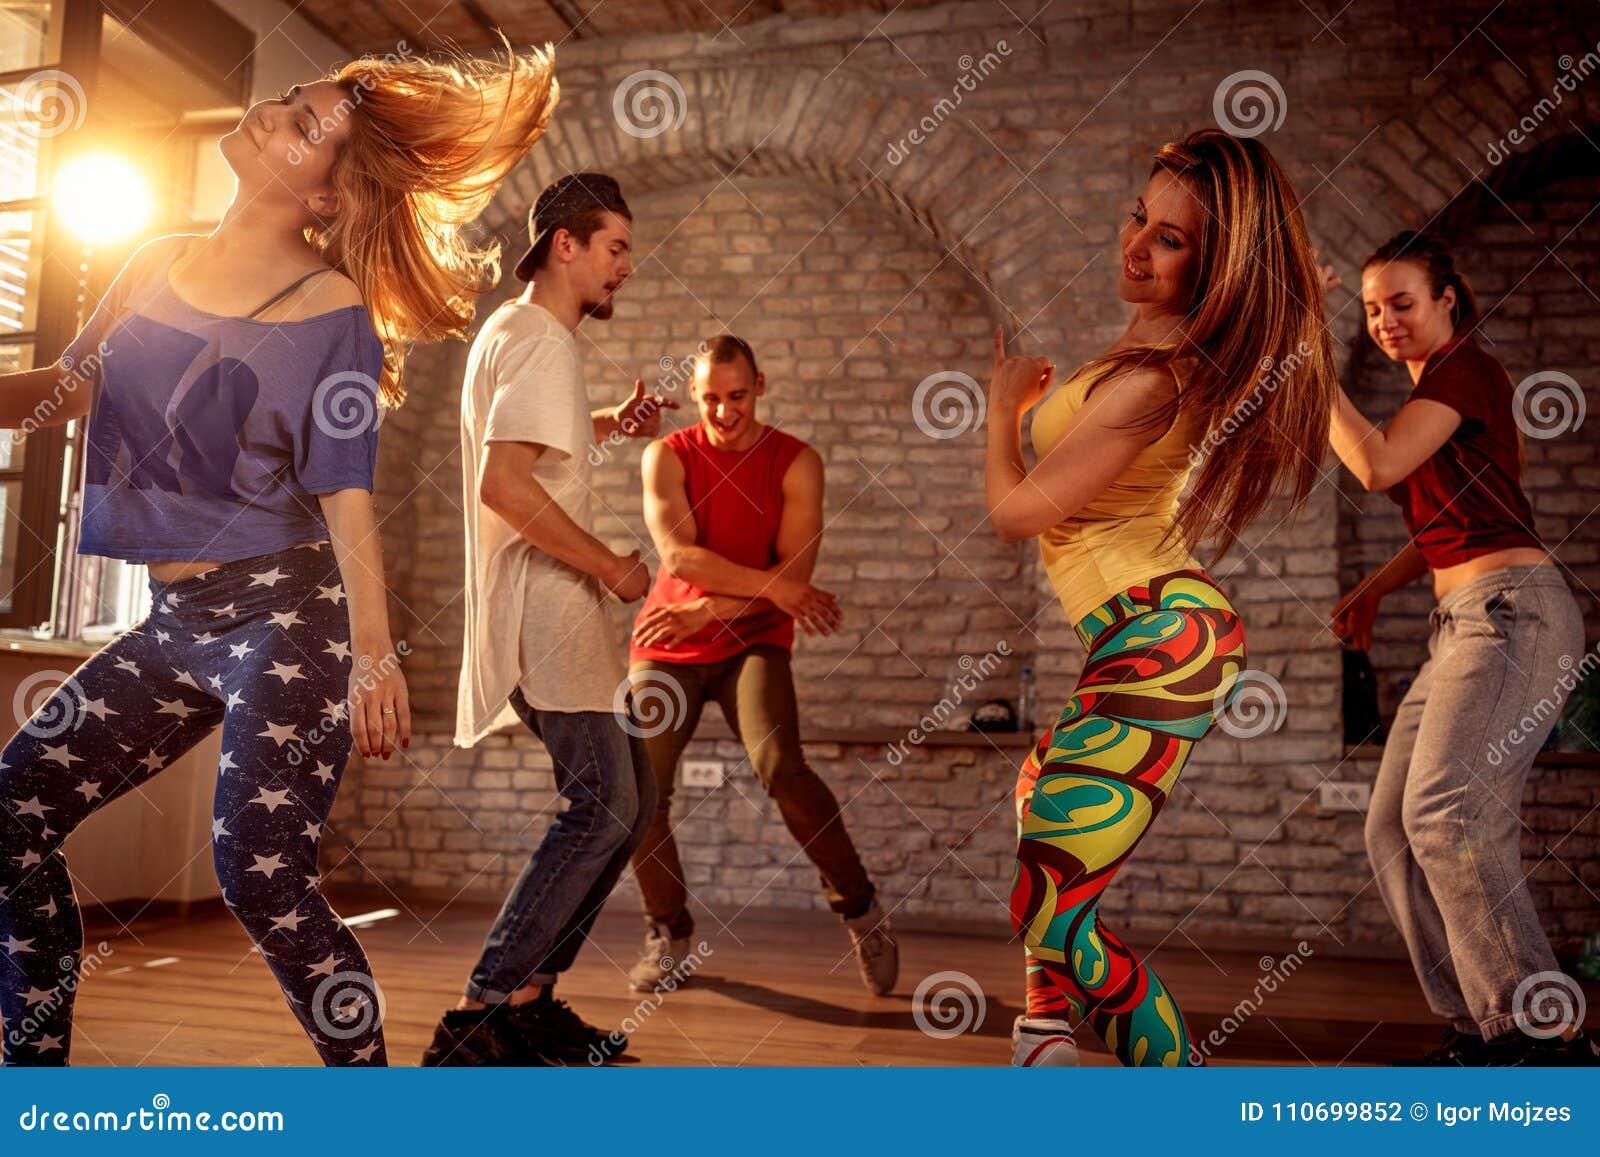 Group of modern street artist break dancers dancing in the studio. Sport, dancing and urban concept